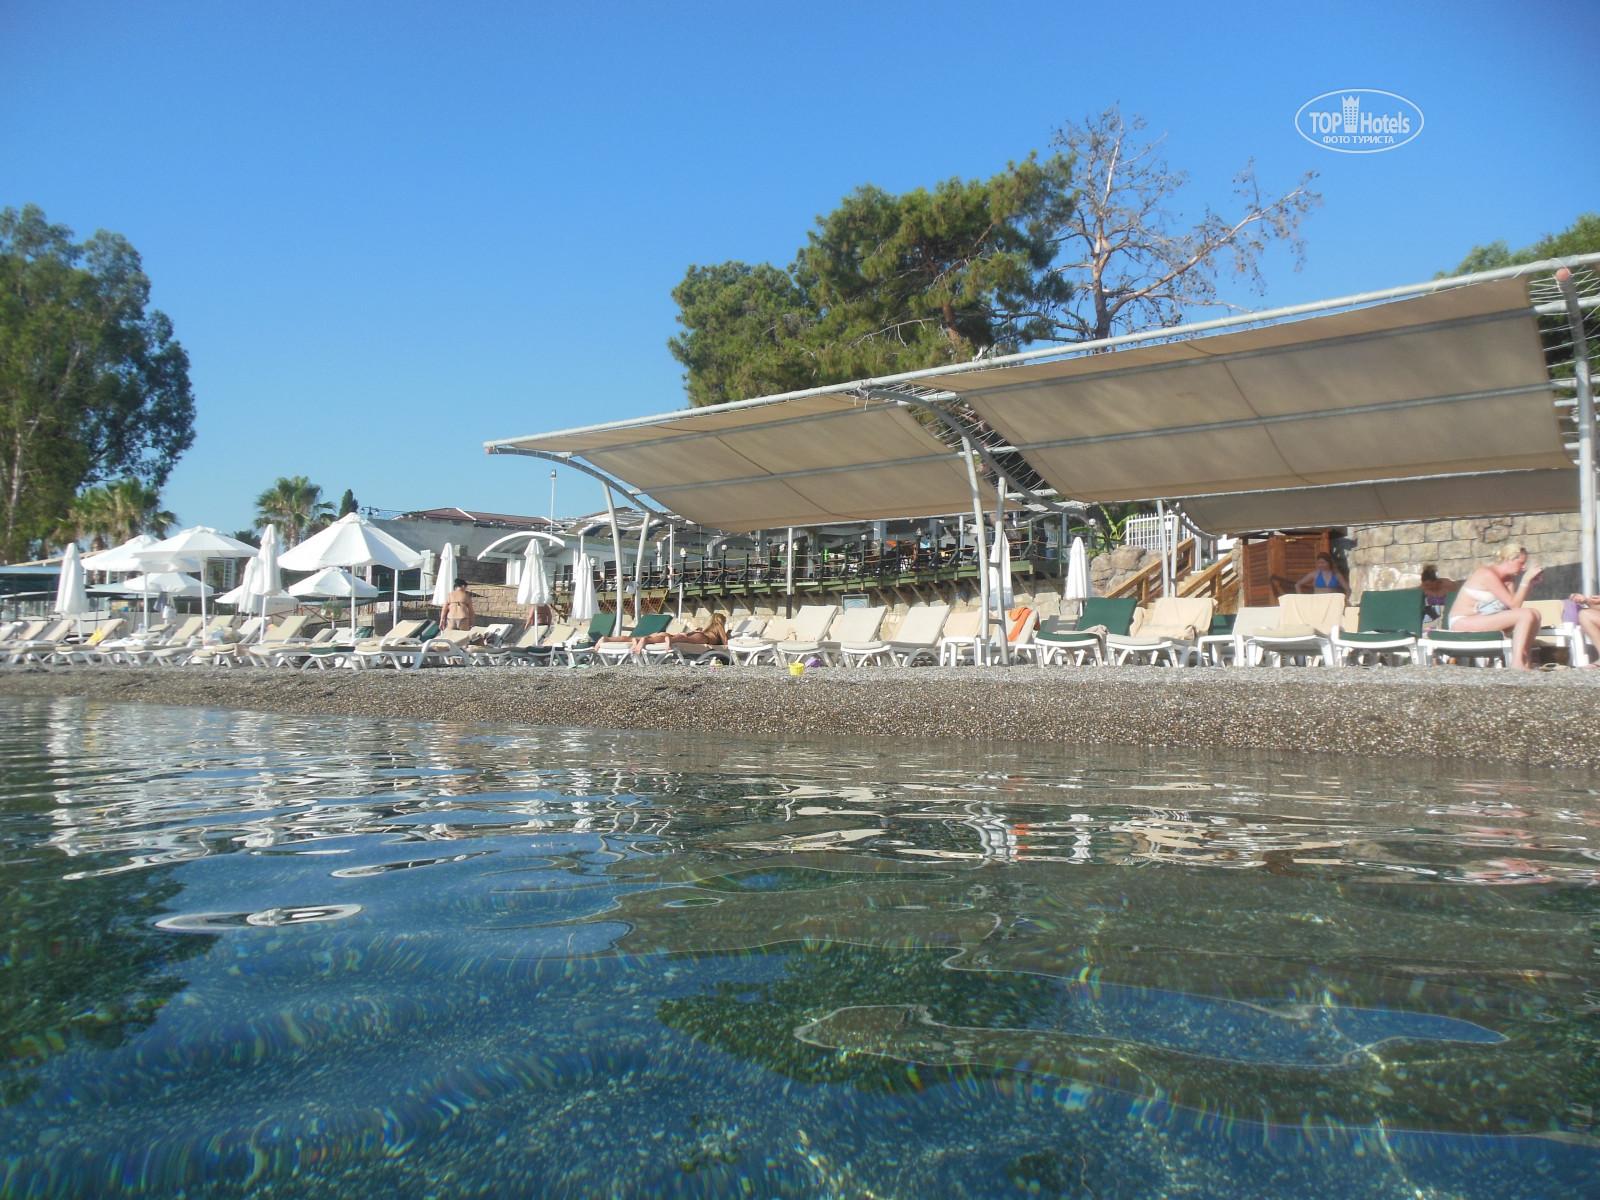 Crystal Aura Beach Resort Spa Tophotels